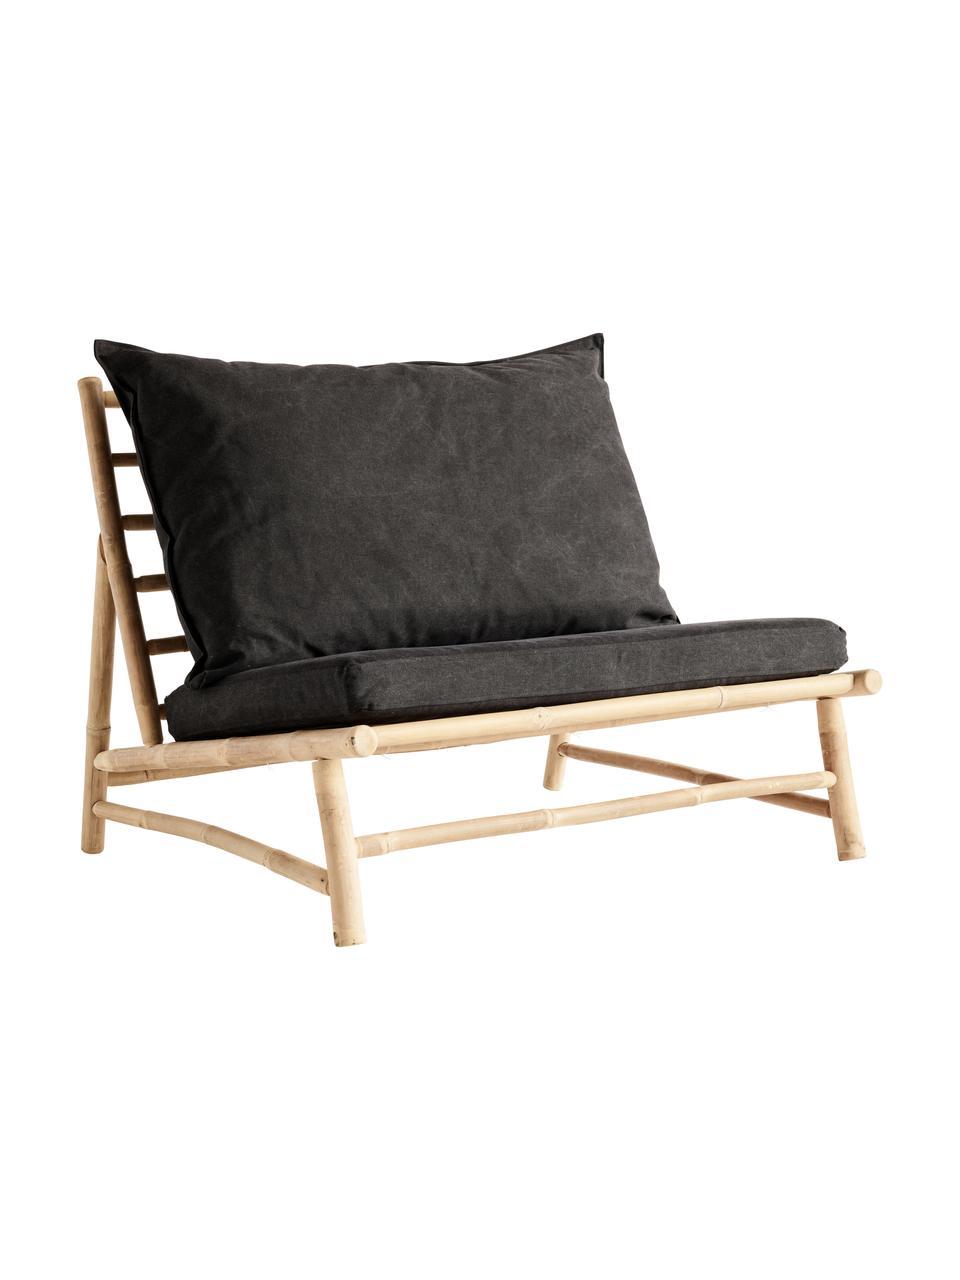 XL Bambus-Loungesessel Bamslow mit Polsterauflage, Gestell: Bambus, Bezug: 100% Baumwolle, Dunkelgrau, Braun, B 100 x T 87 cm